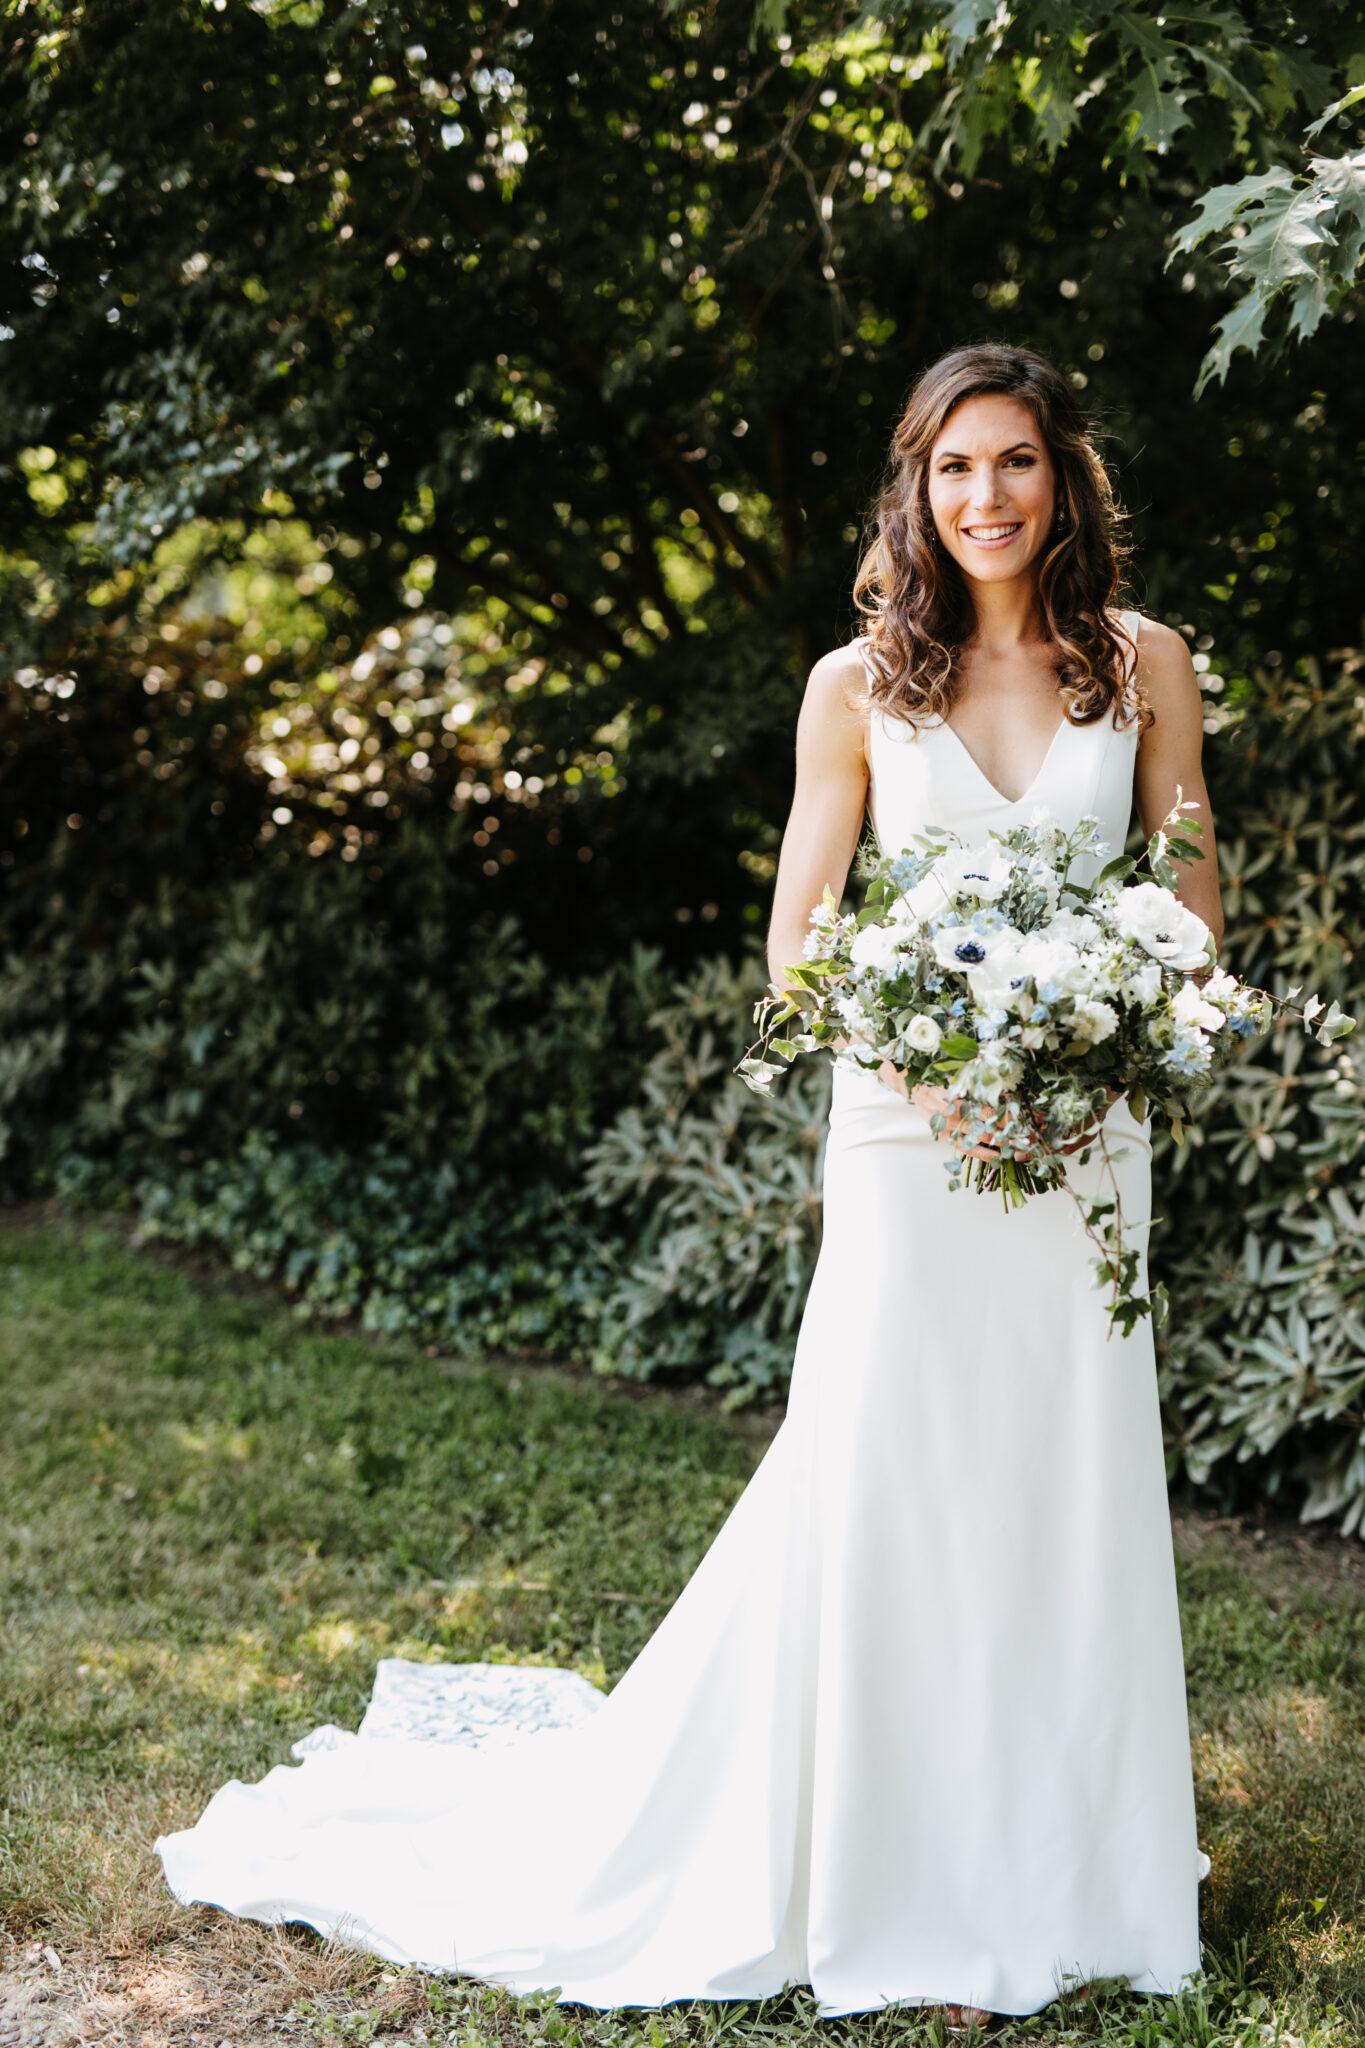 bride holding bouquet outdoors